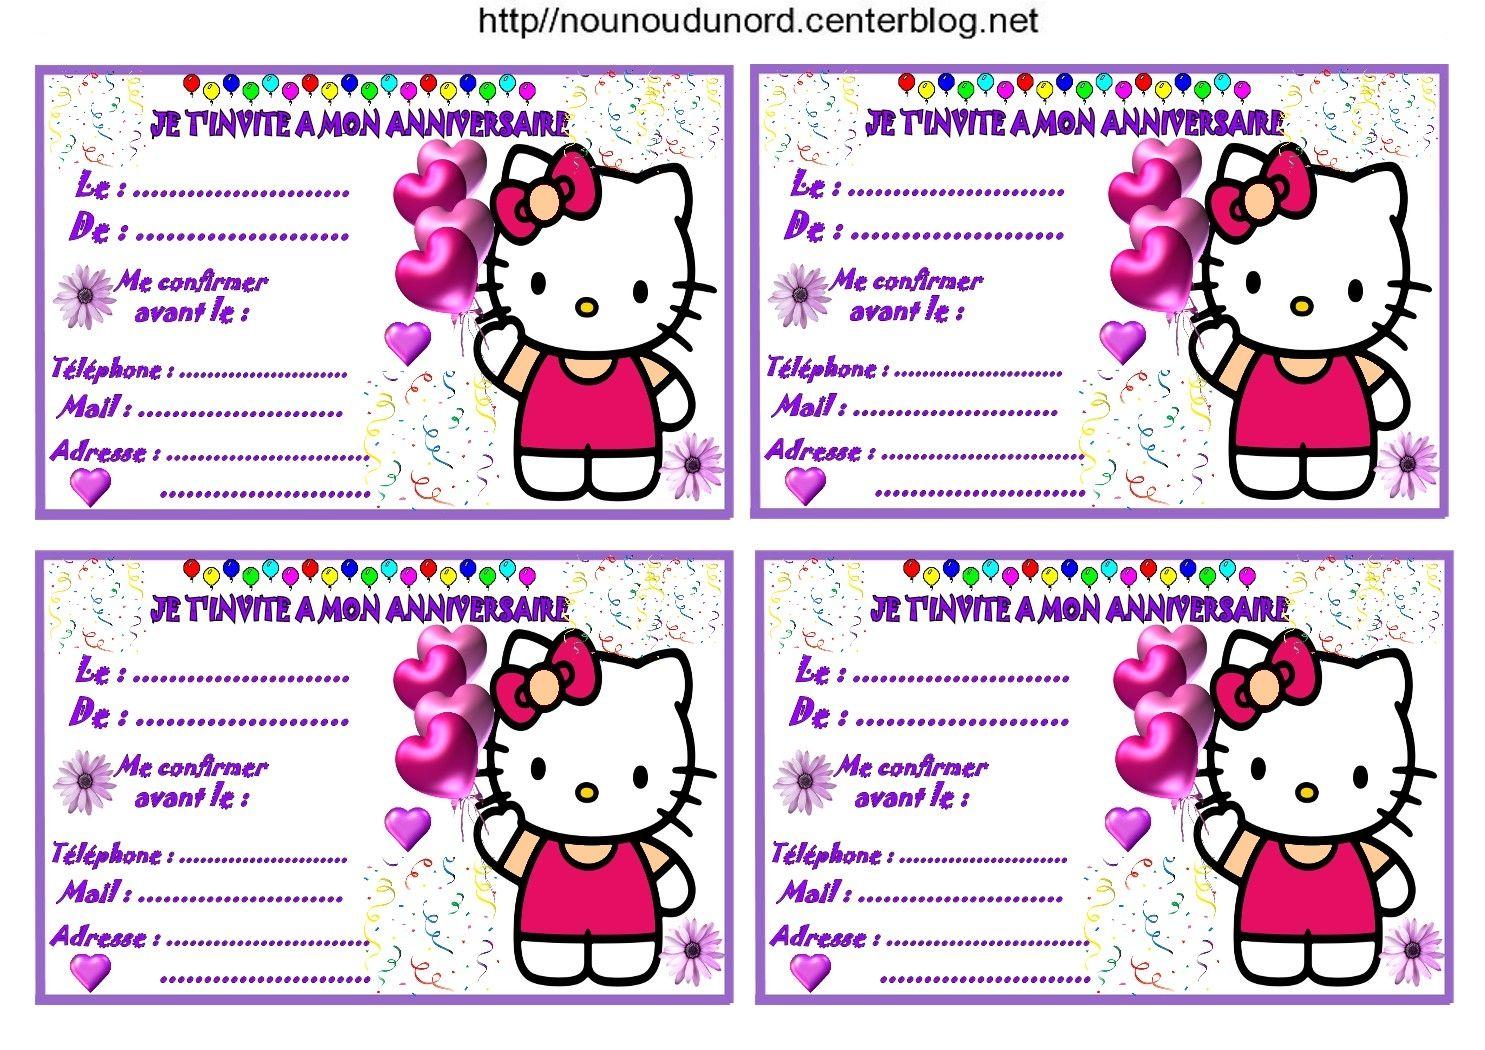 Etiquettes, invitations Hello Kitty pour anniversaire   Anniversaire hello kitty, Carte ...